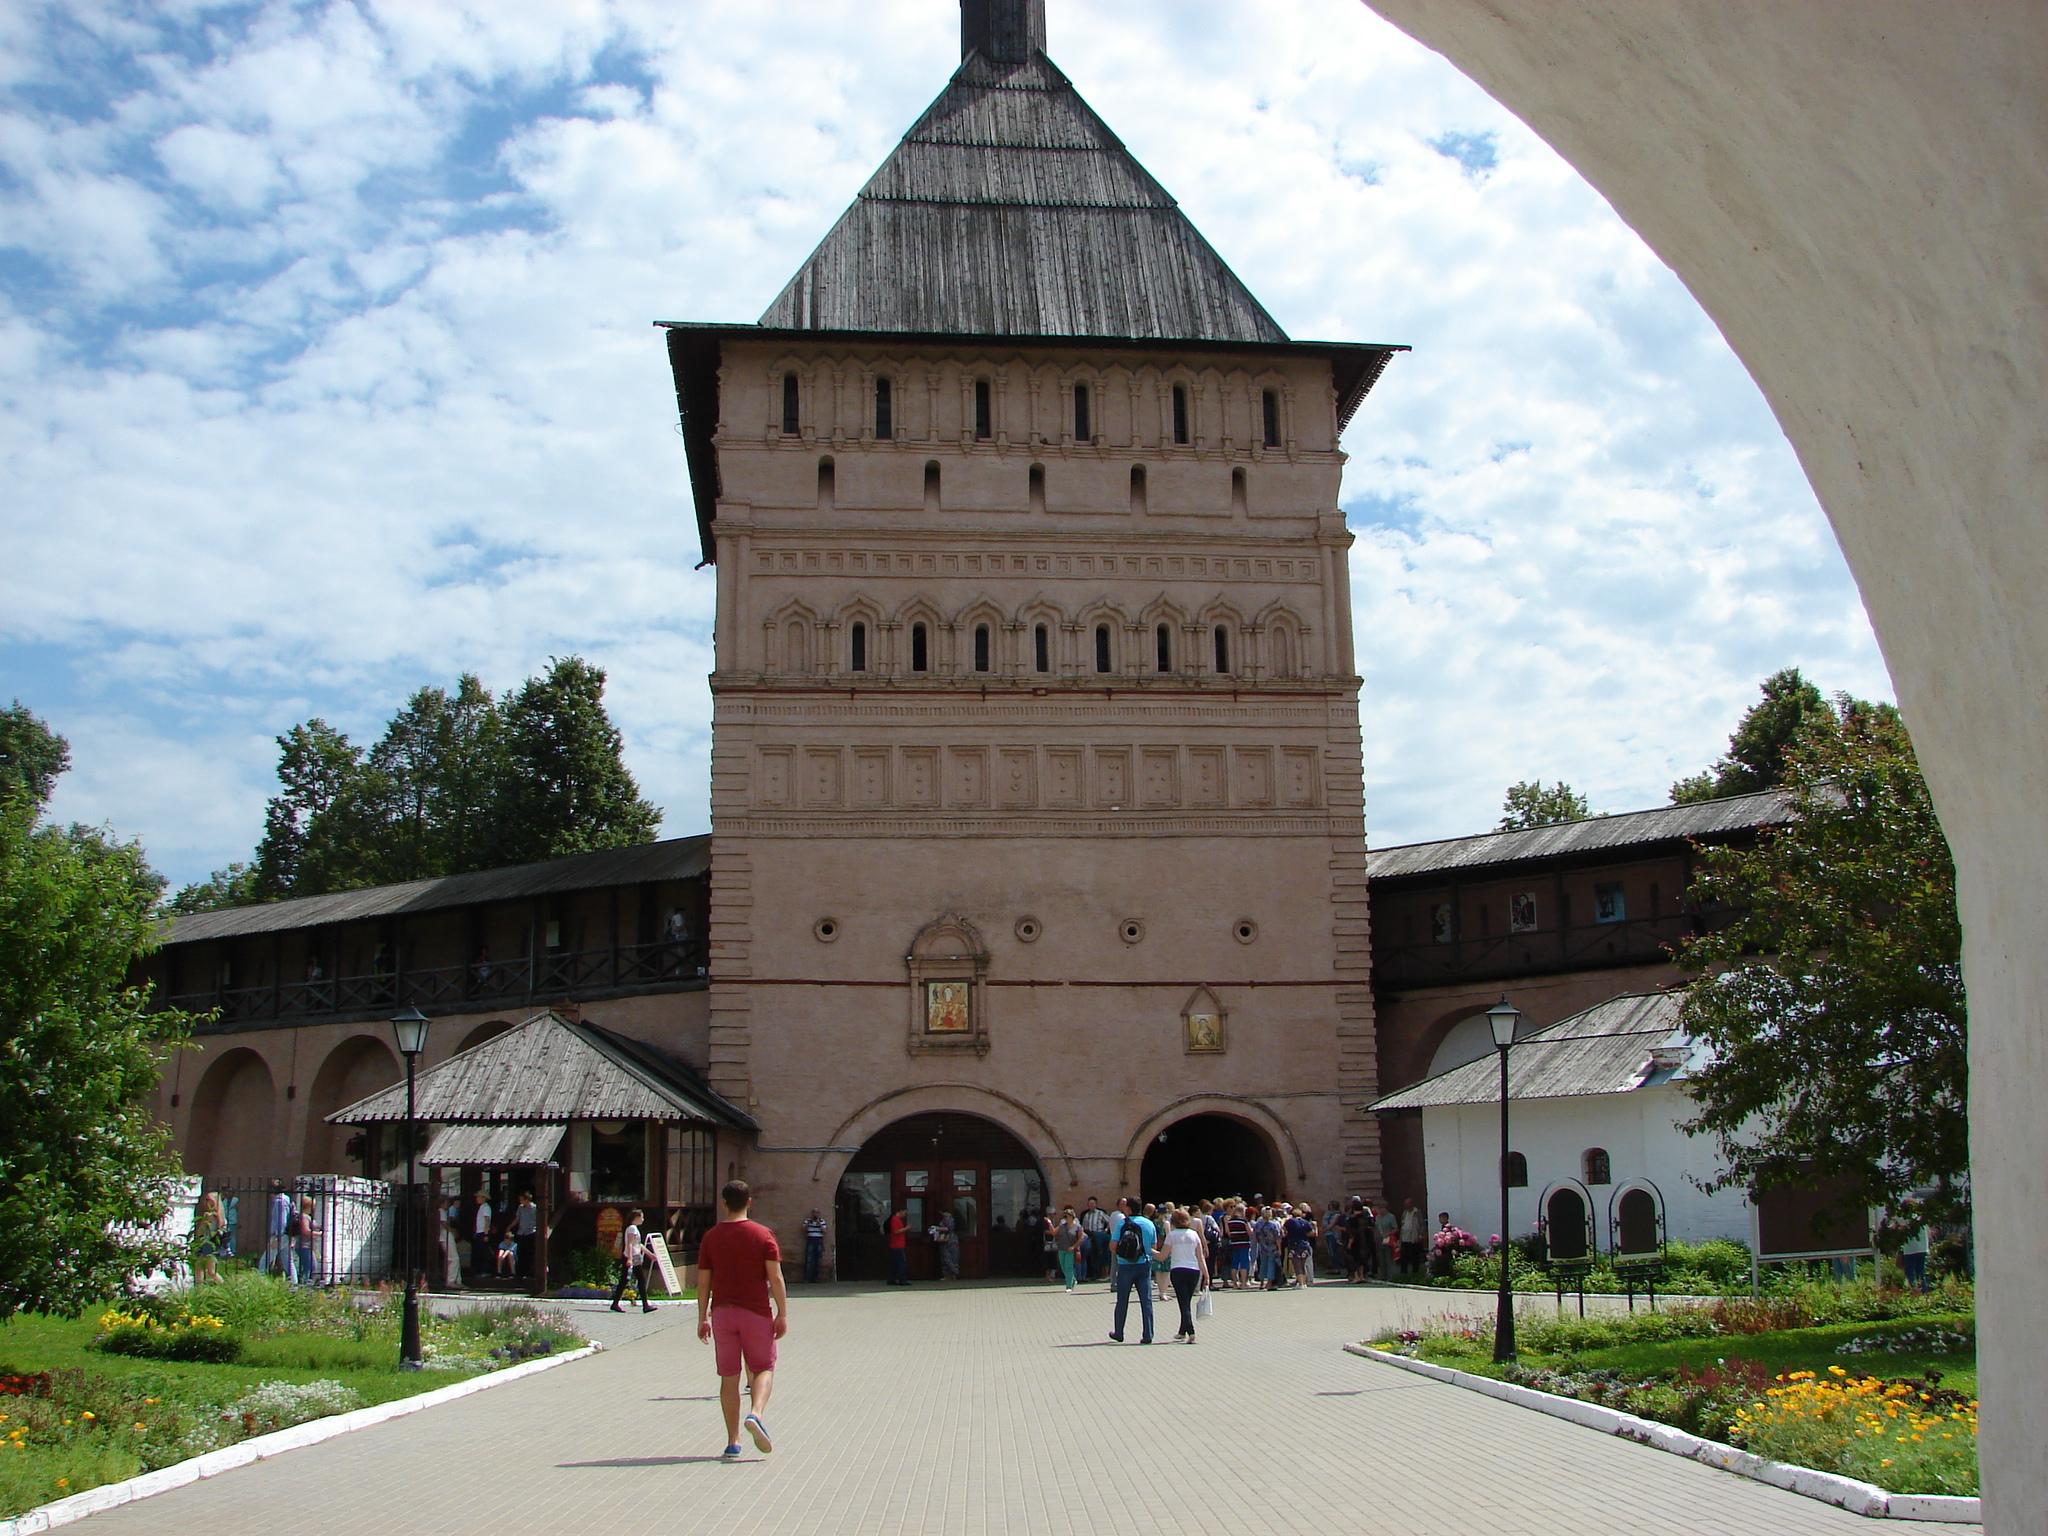 Obronny monastyr - brama wjazdowa